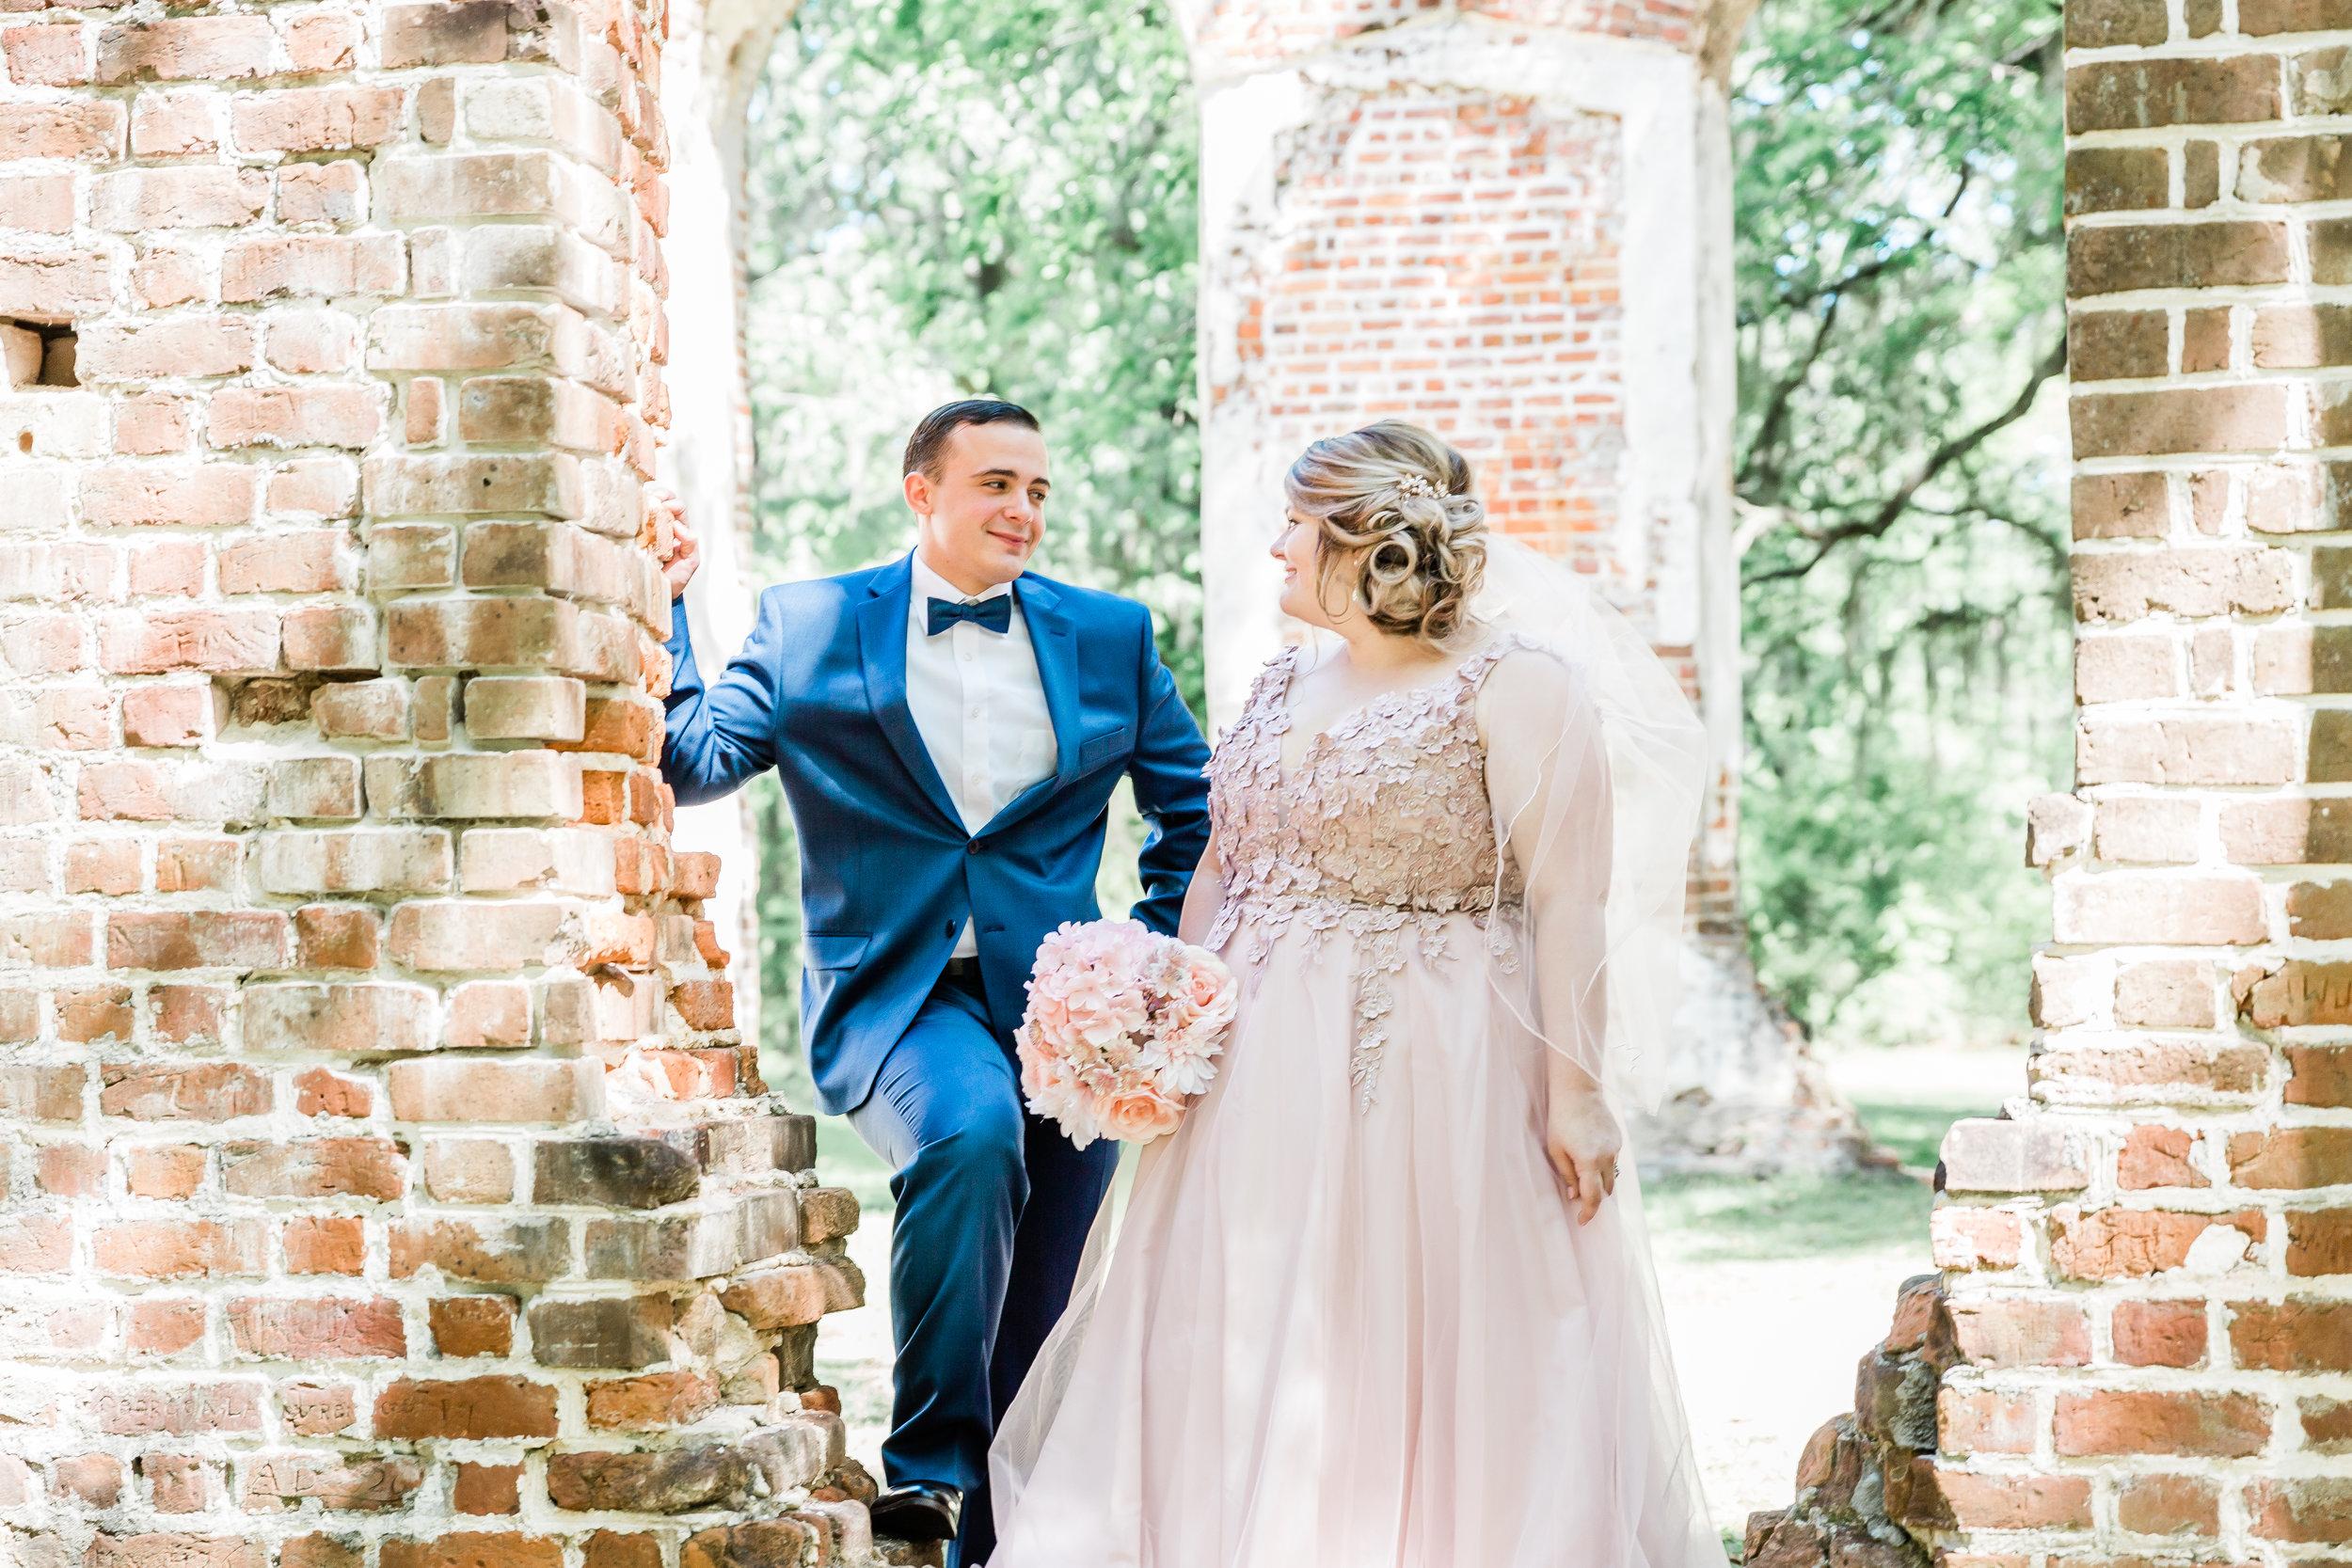 20190417-Southern Lens Photography-savannah family photographer- Ashley and Zack-old sheldon church ruins-201926.jpg